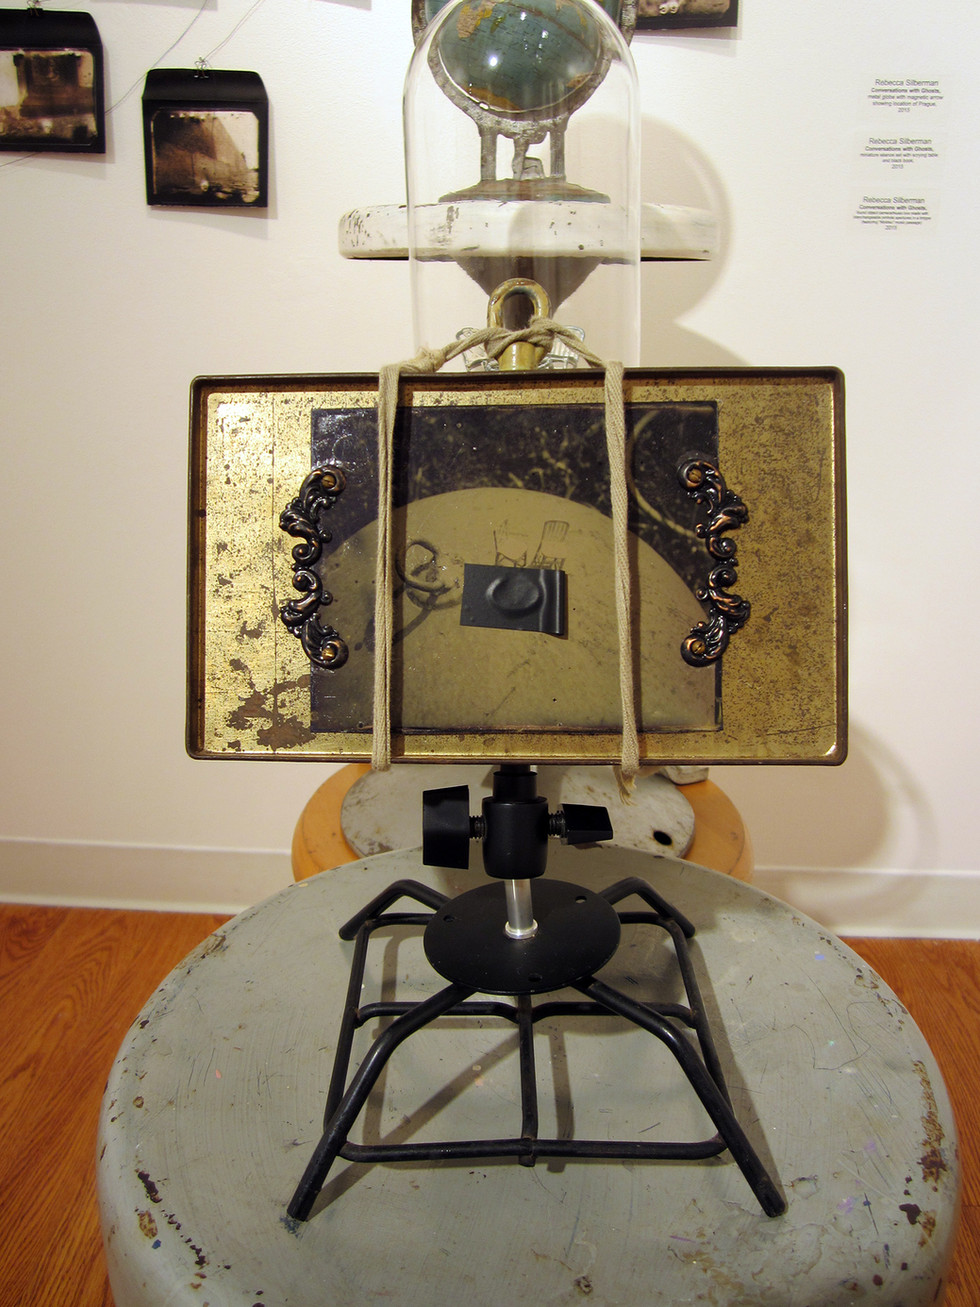 PASSAGE, (Dymph de Wild and Rebecca Silberman), New Image Gallery